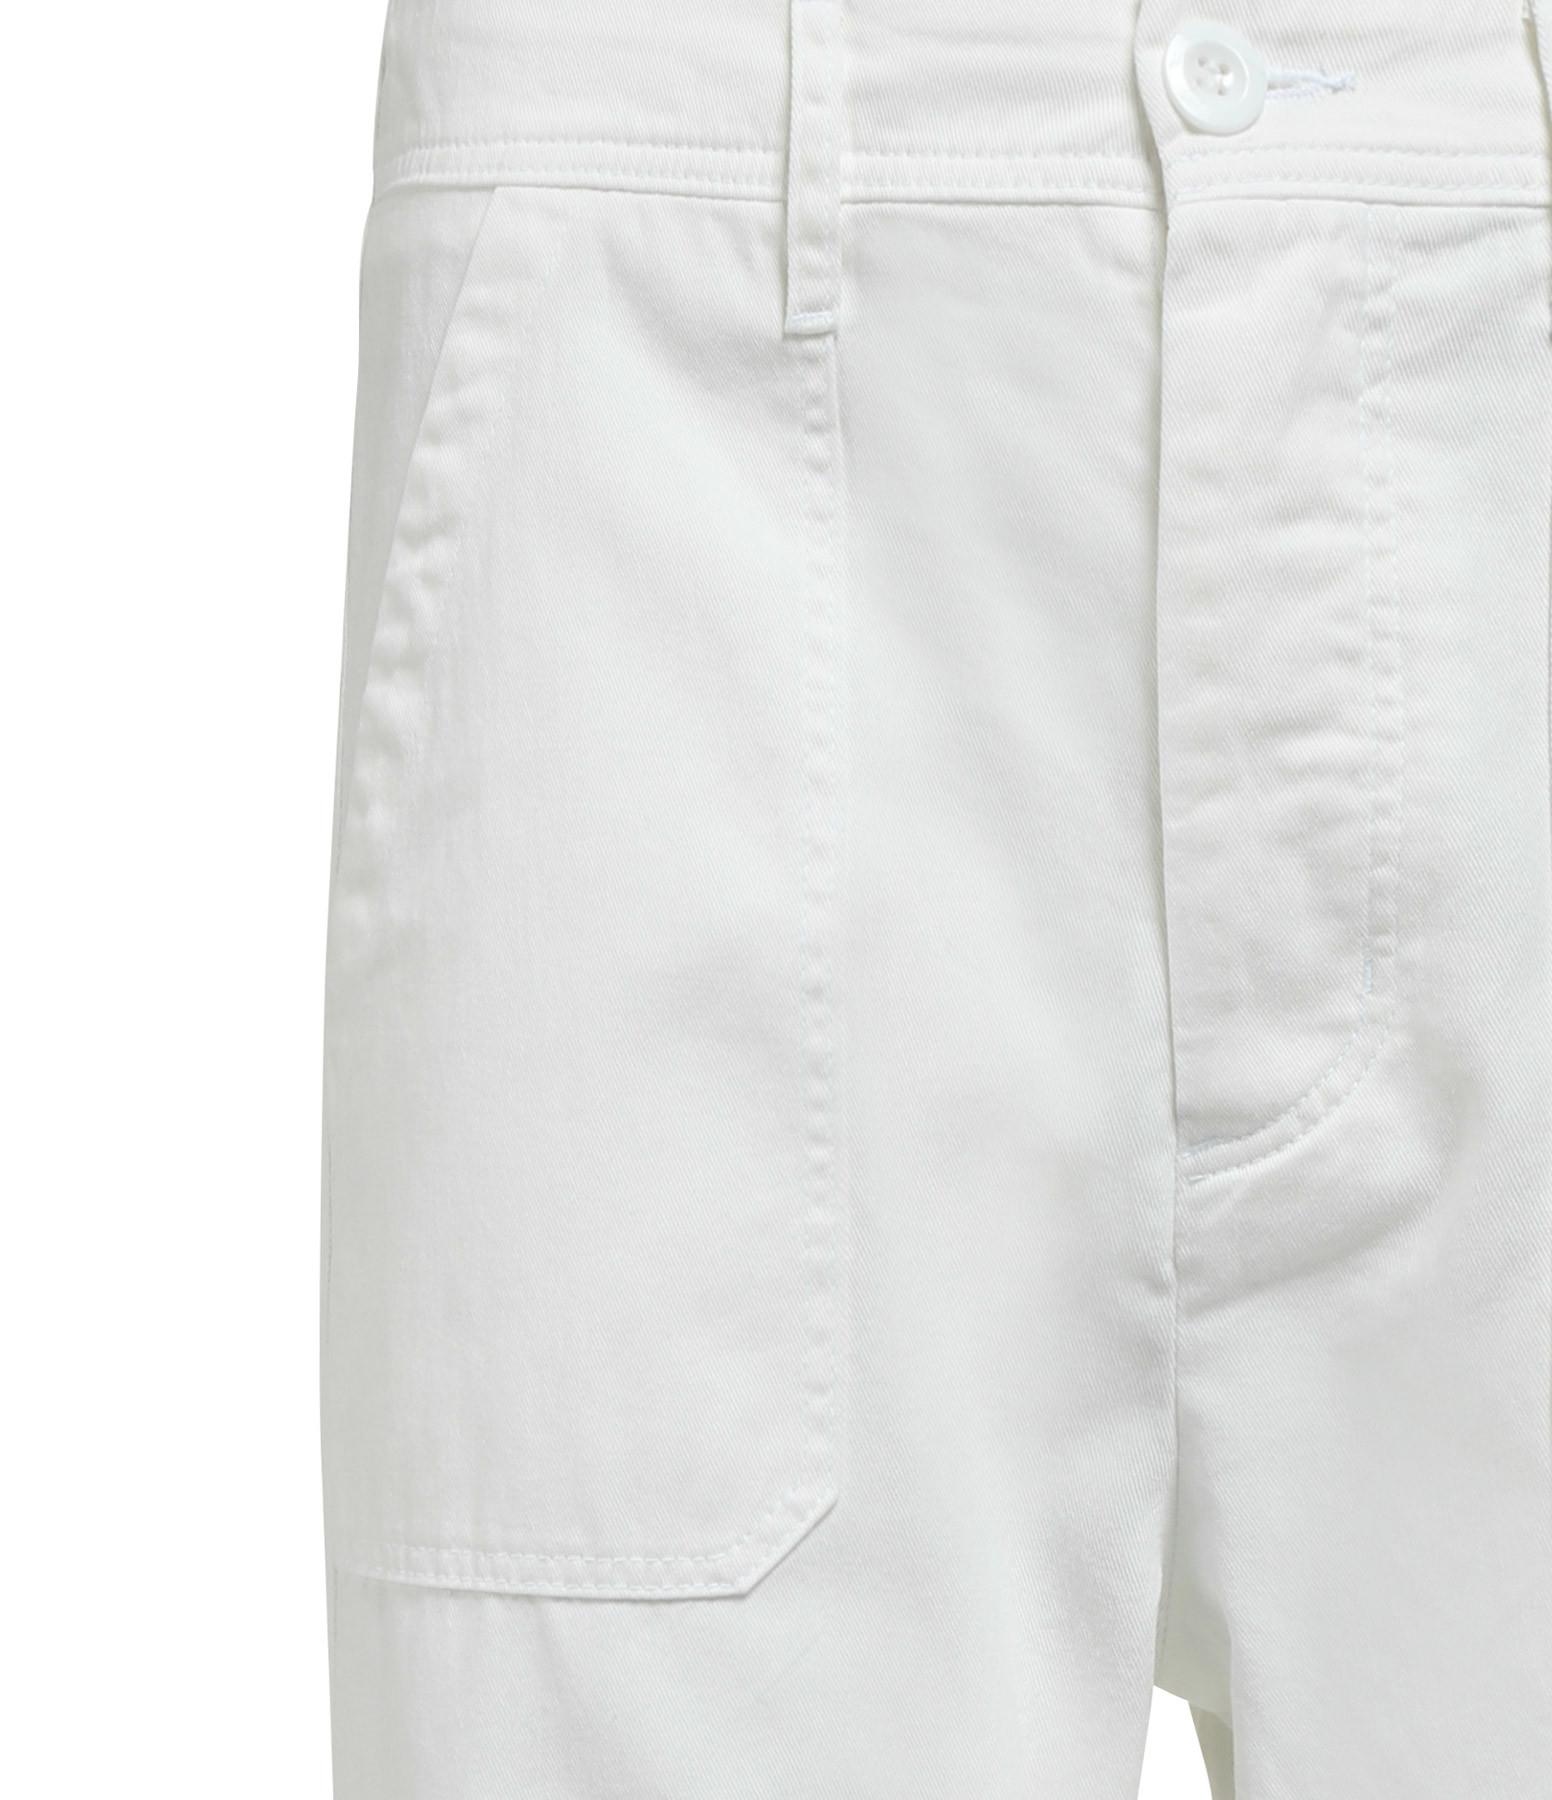 XIRENA - Pantalon Tucket Twill Blanc